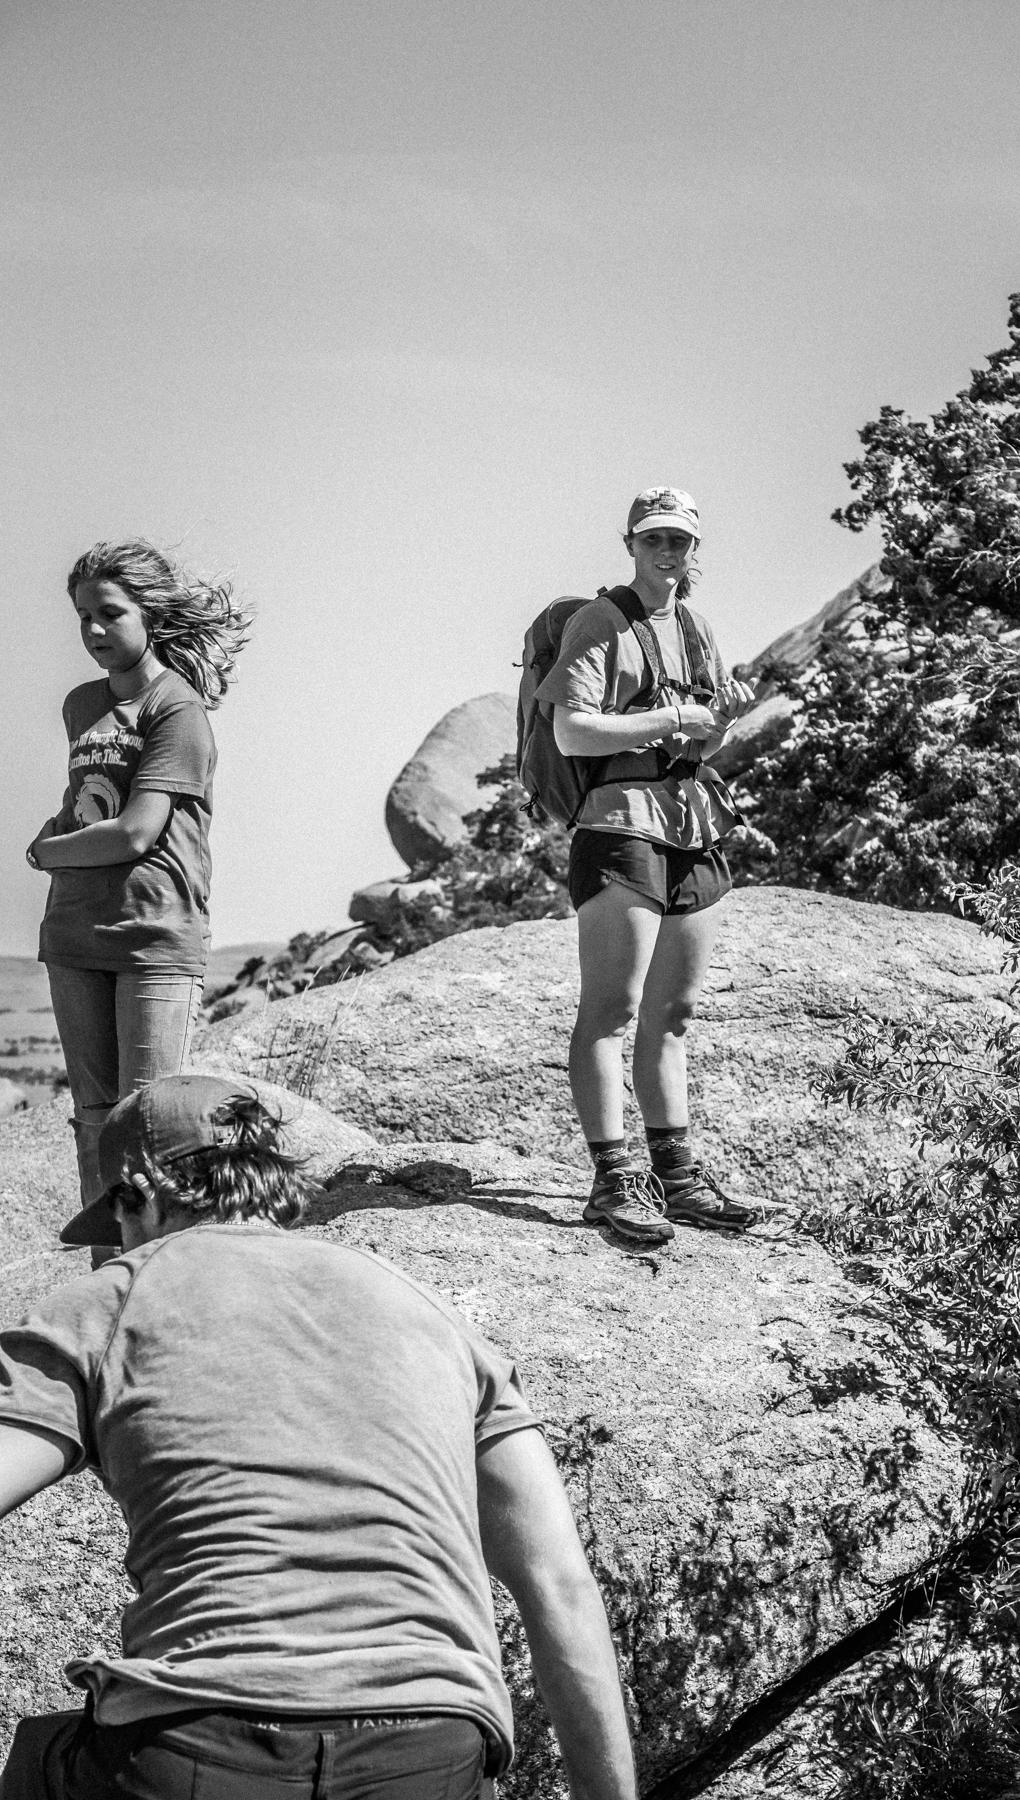 Glass Mountain Peak to Apple & Pear -